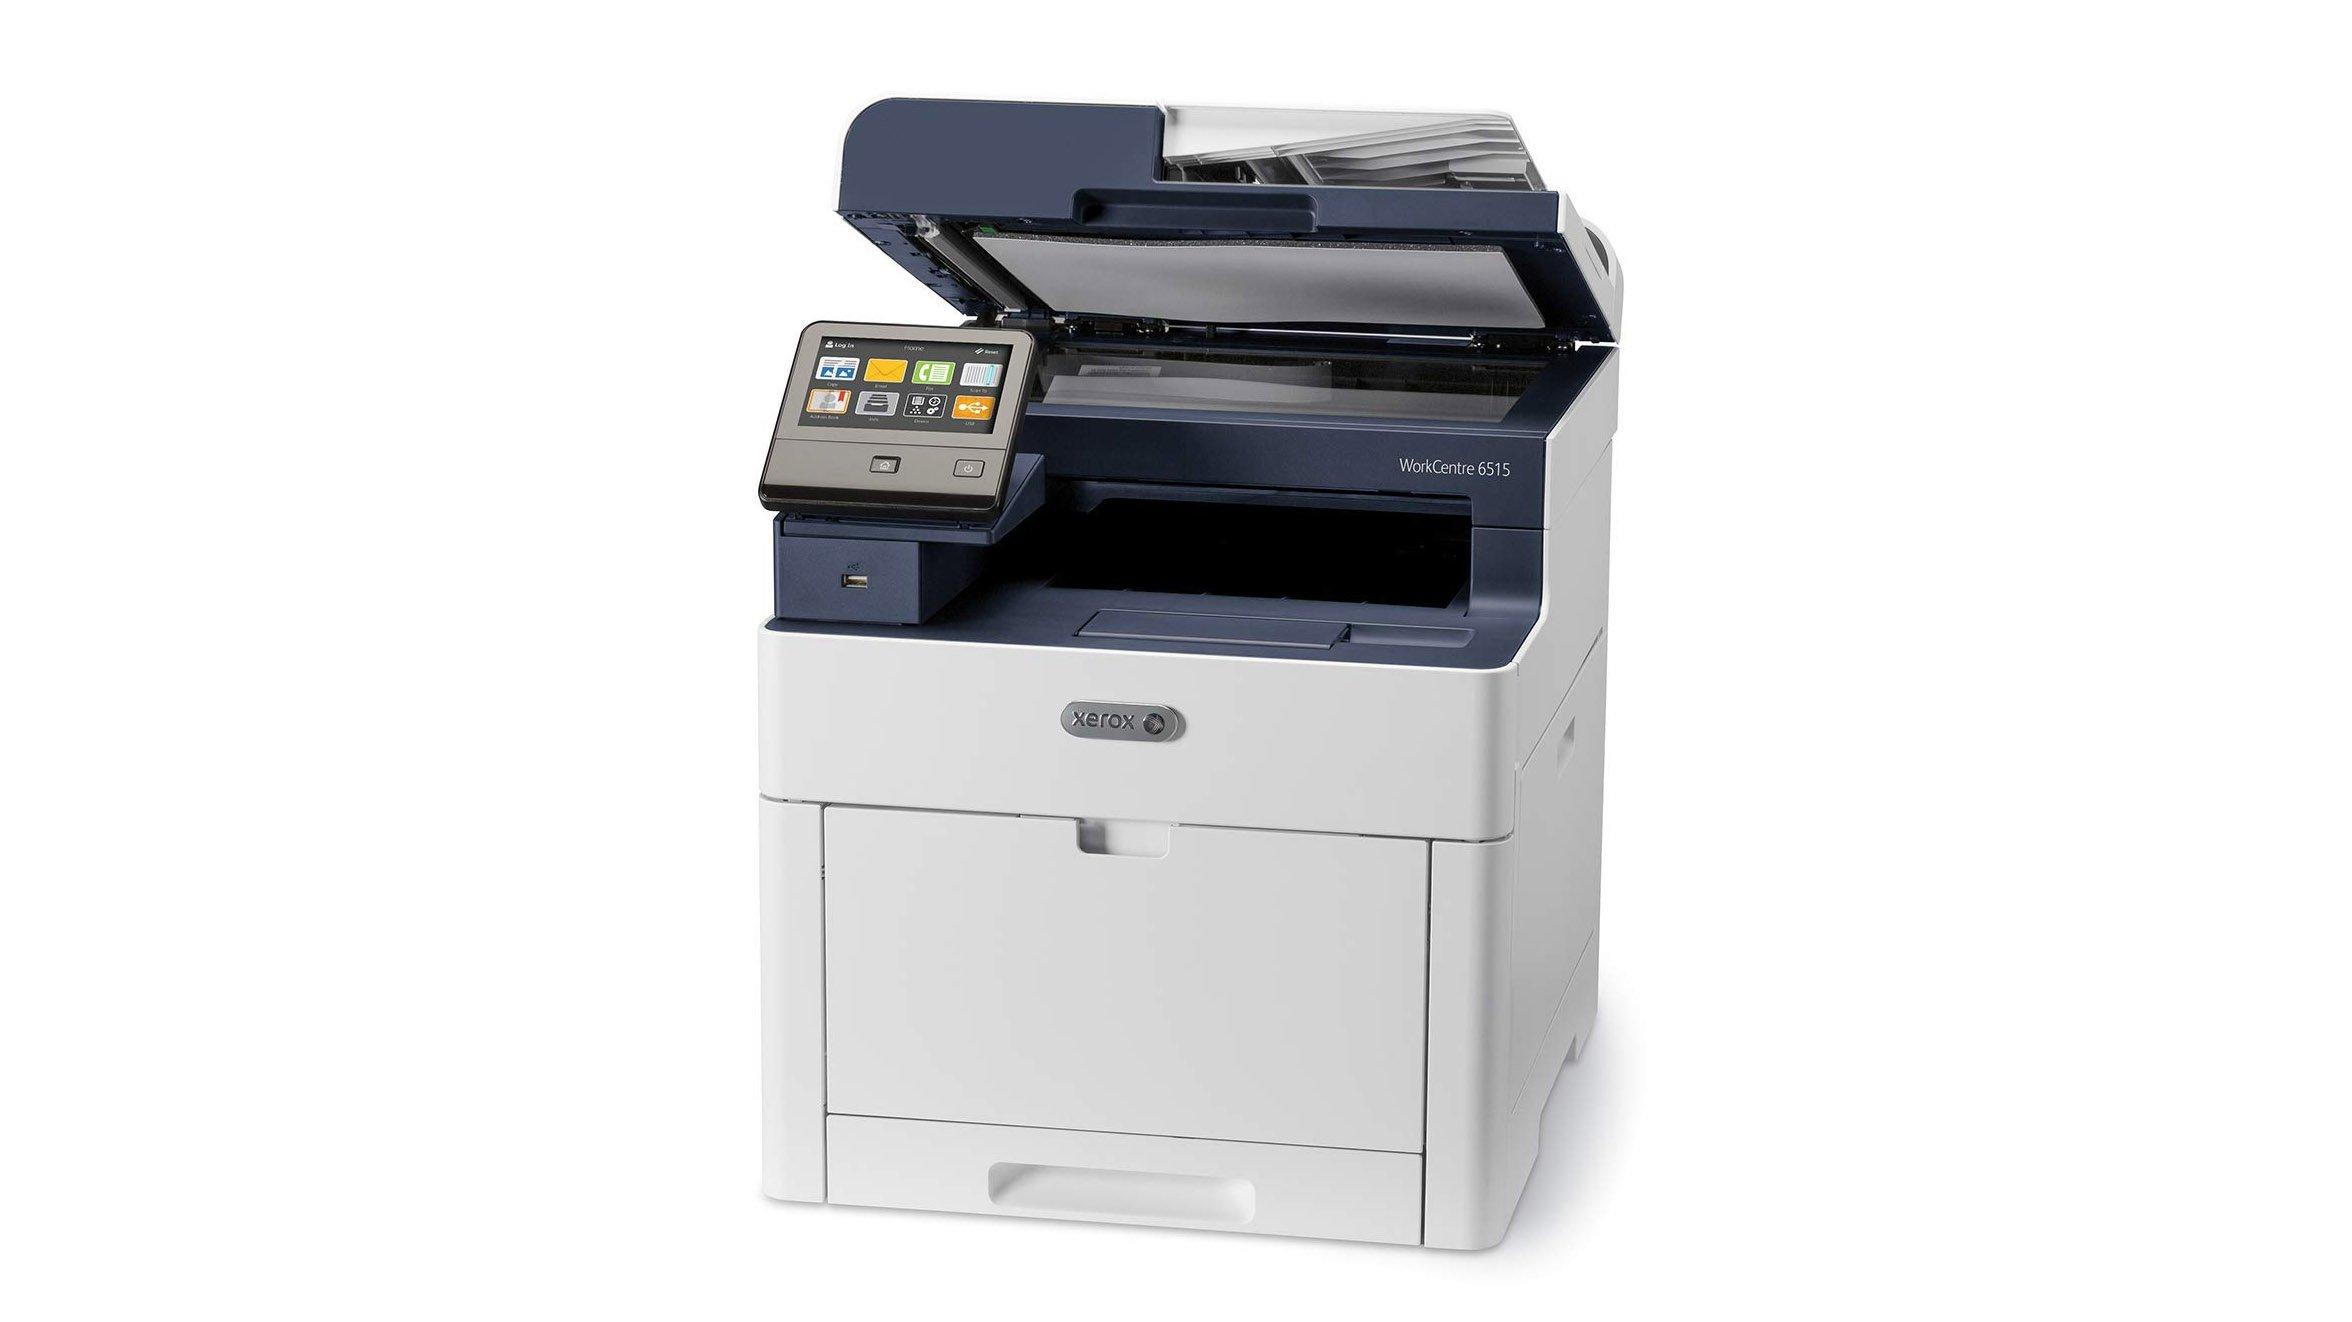 Best printer 2019: Inkjet and laser printers for super-sharp